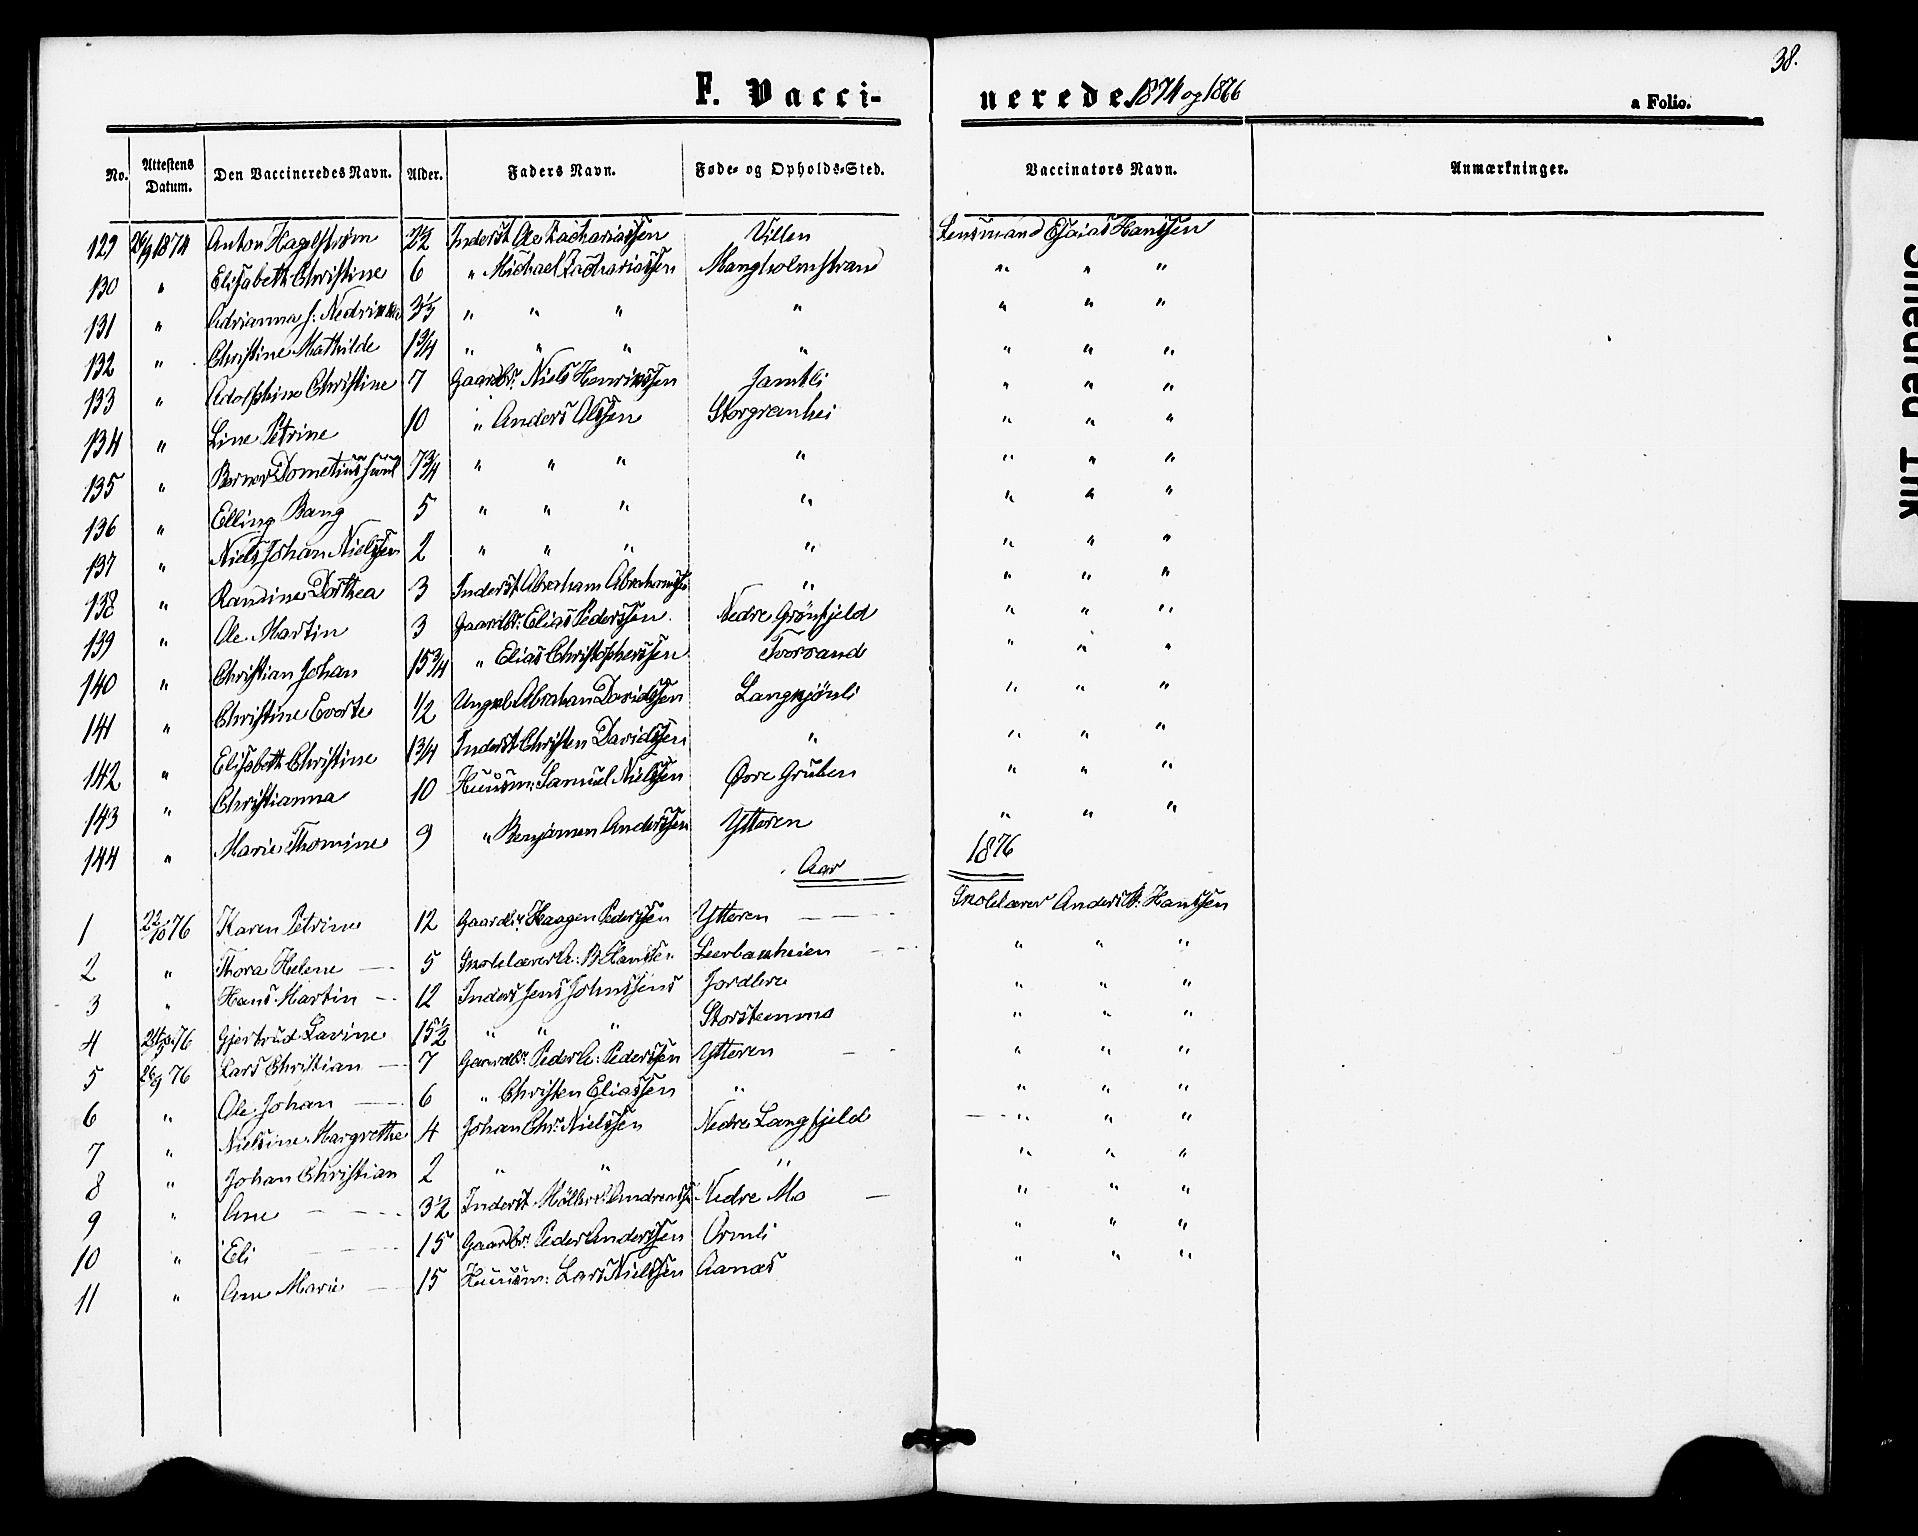 SAT, Ministerialprotokoller, klokkerbøker og fødselsregistre - Nordland, 827/L0397: Ministerialbok nr. 827A09, 1862-1876, s. 38